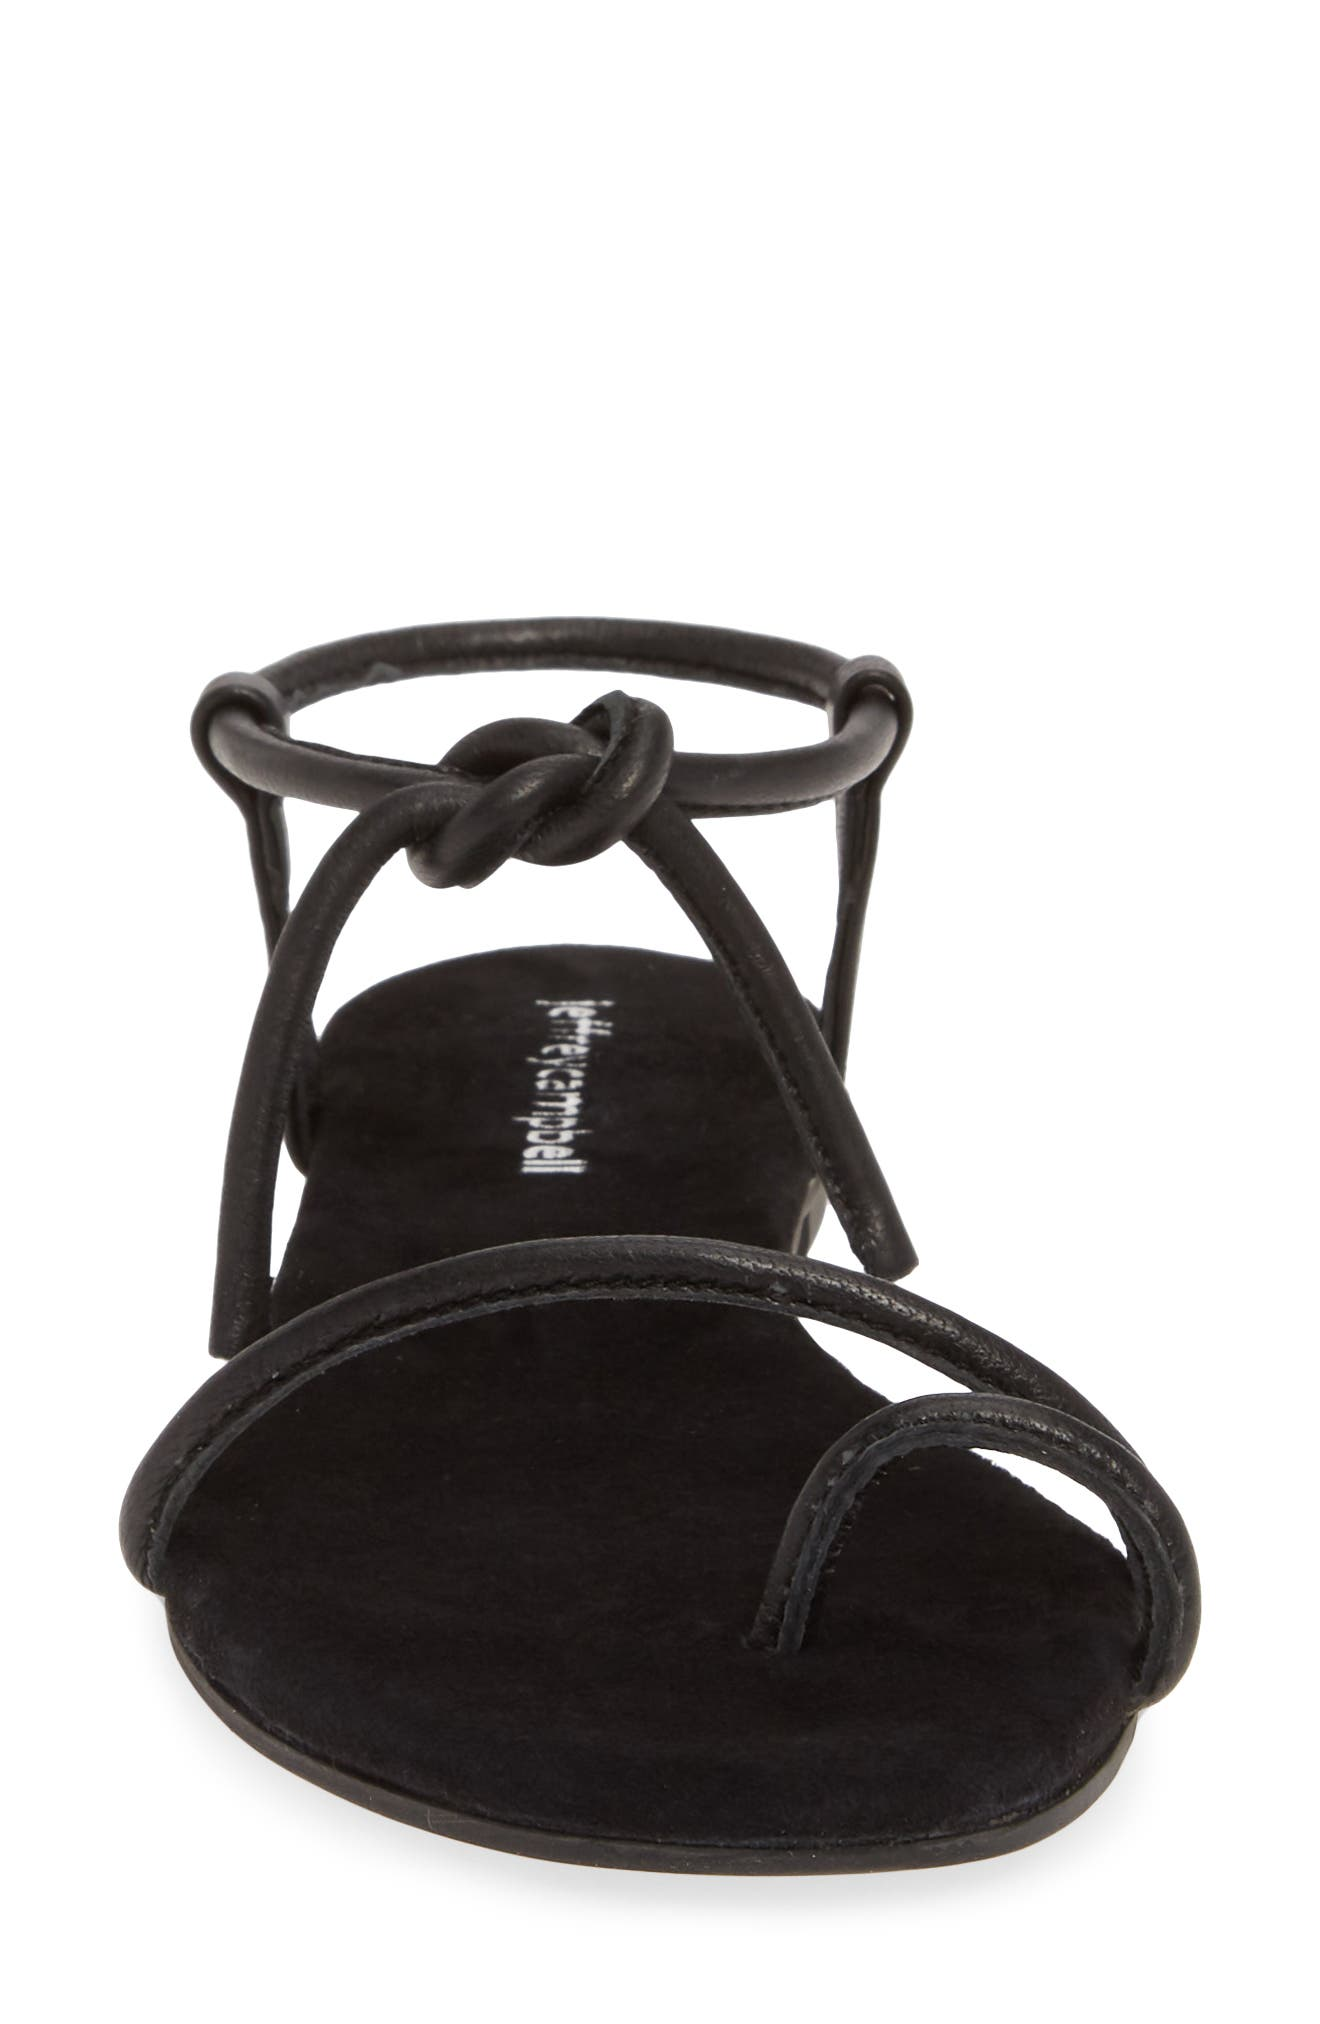 JEFFREY CAMPBELL, Aster Tie Sandal, Alternate thumbnail 4, color, BLACK LEATHER